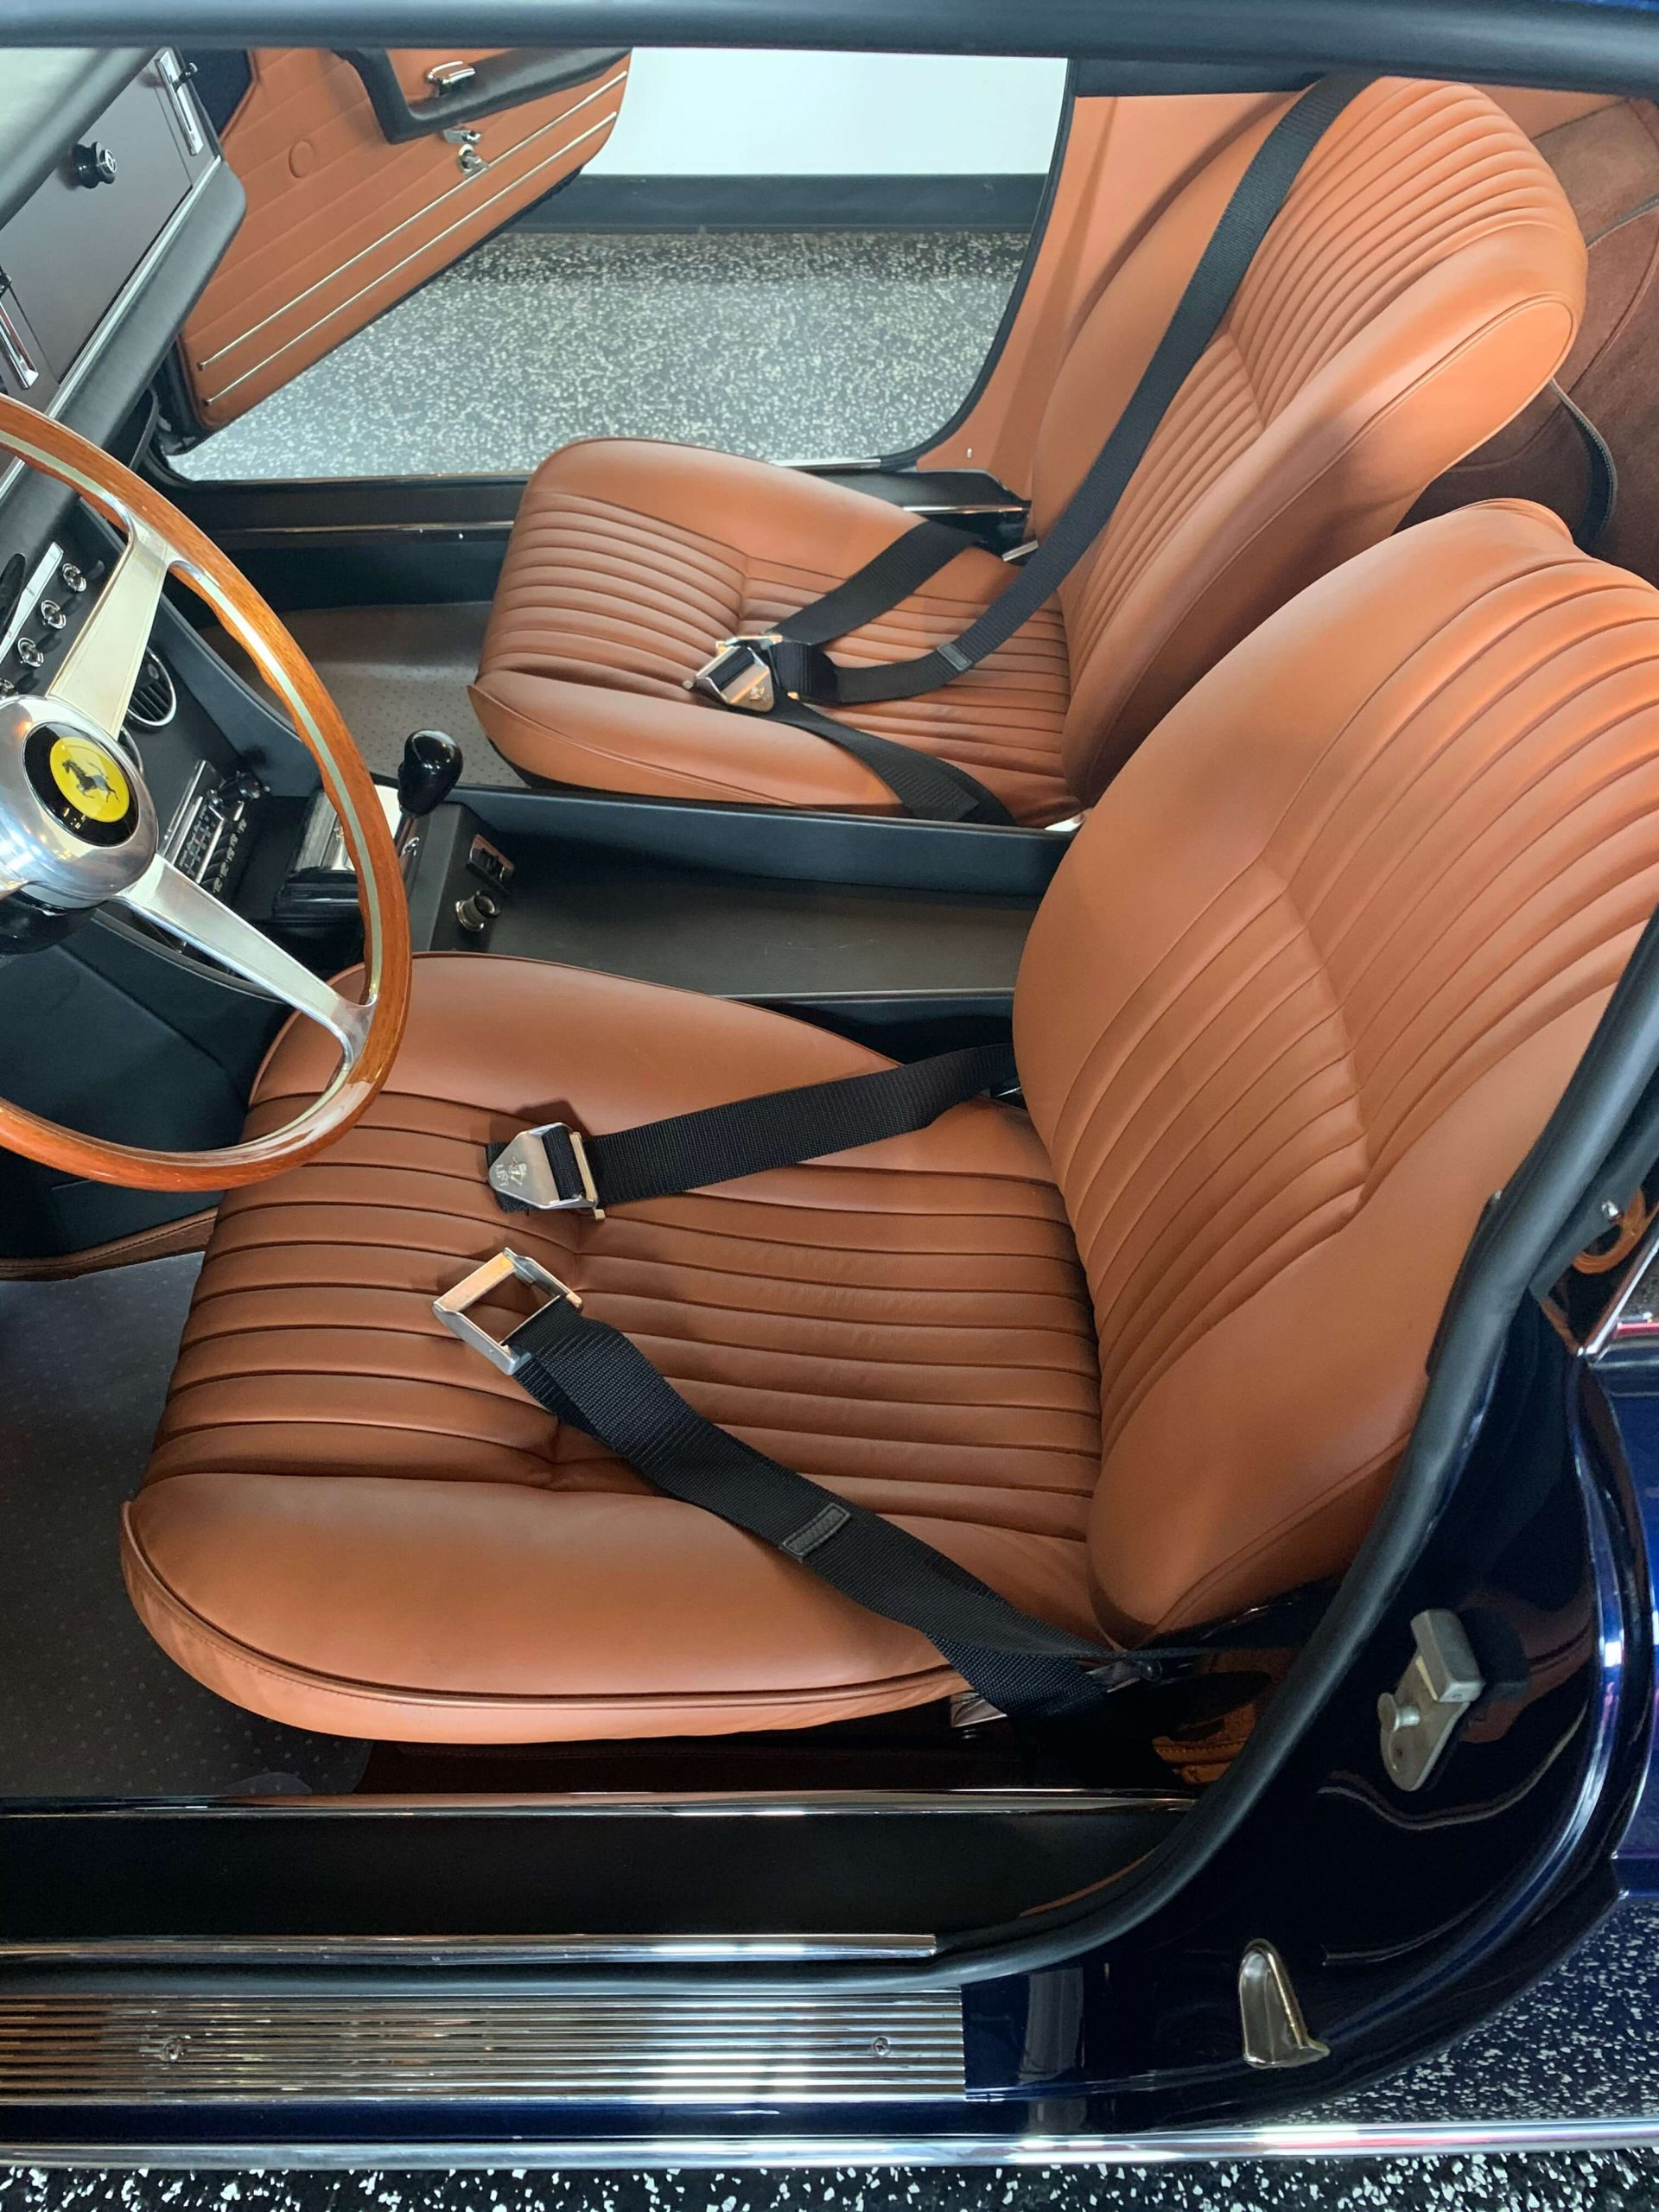 Ferrari 330 GTC Interior from left